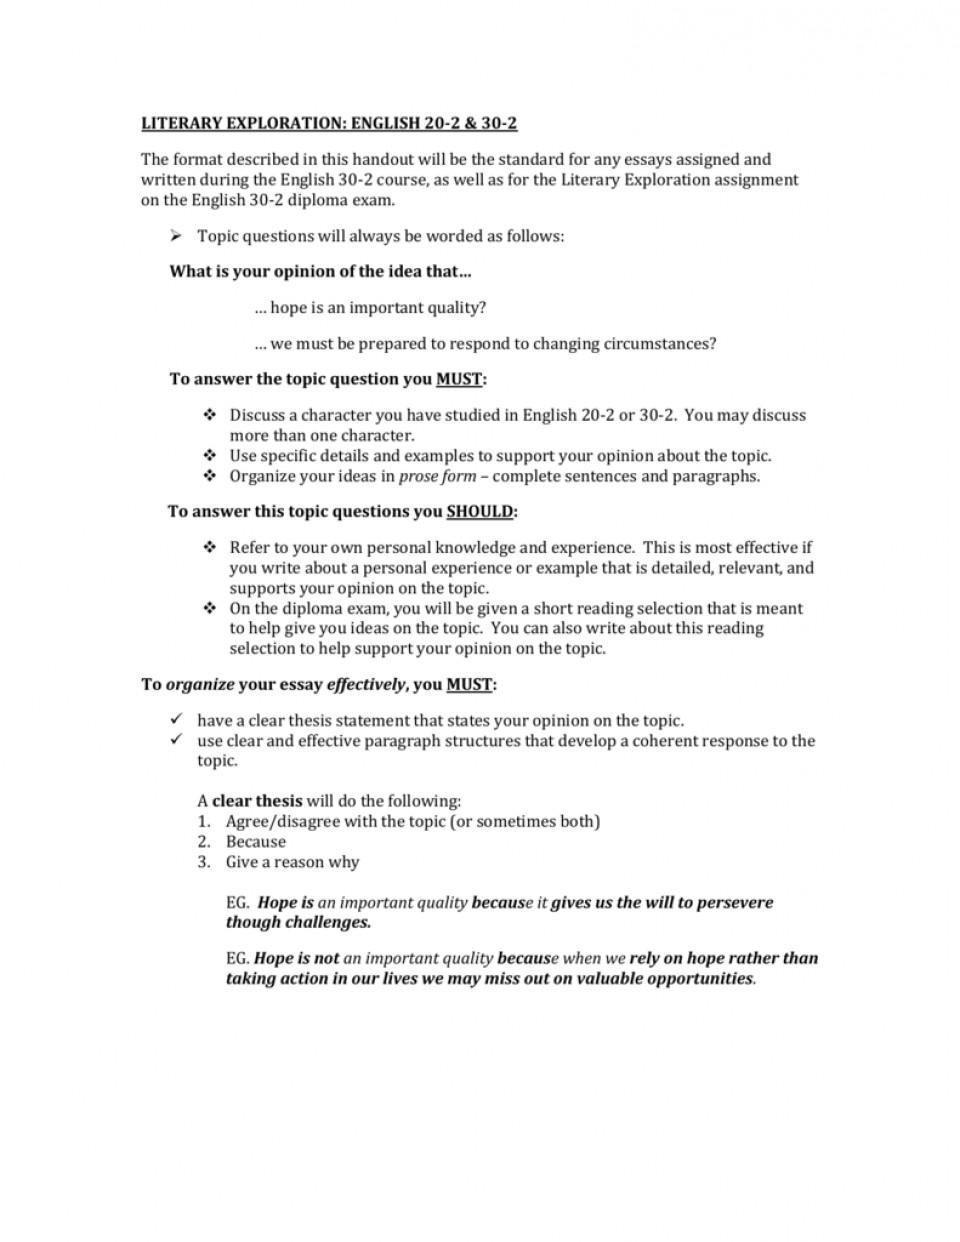 002 Essay Example English Examples Form 007481393 1 Wondrous 2 960